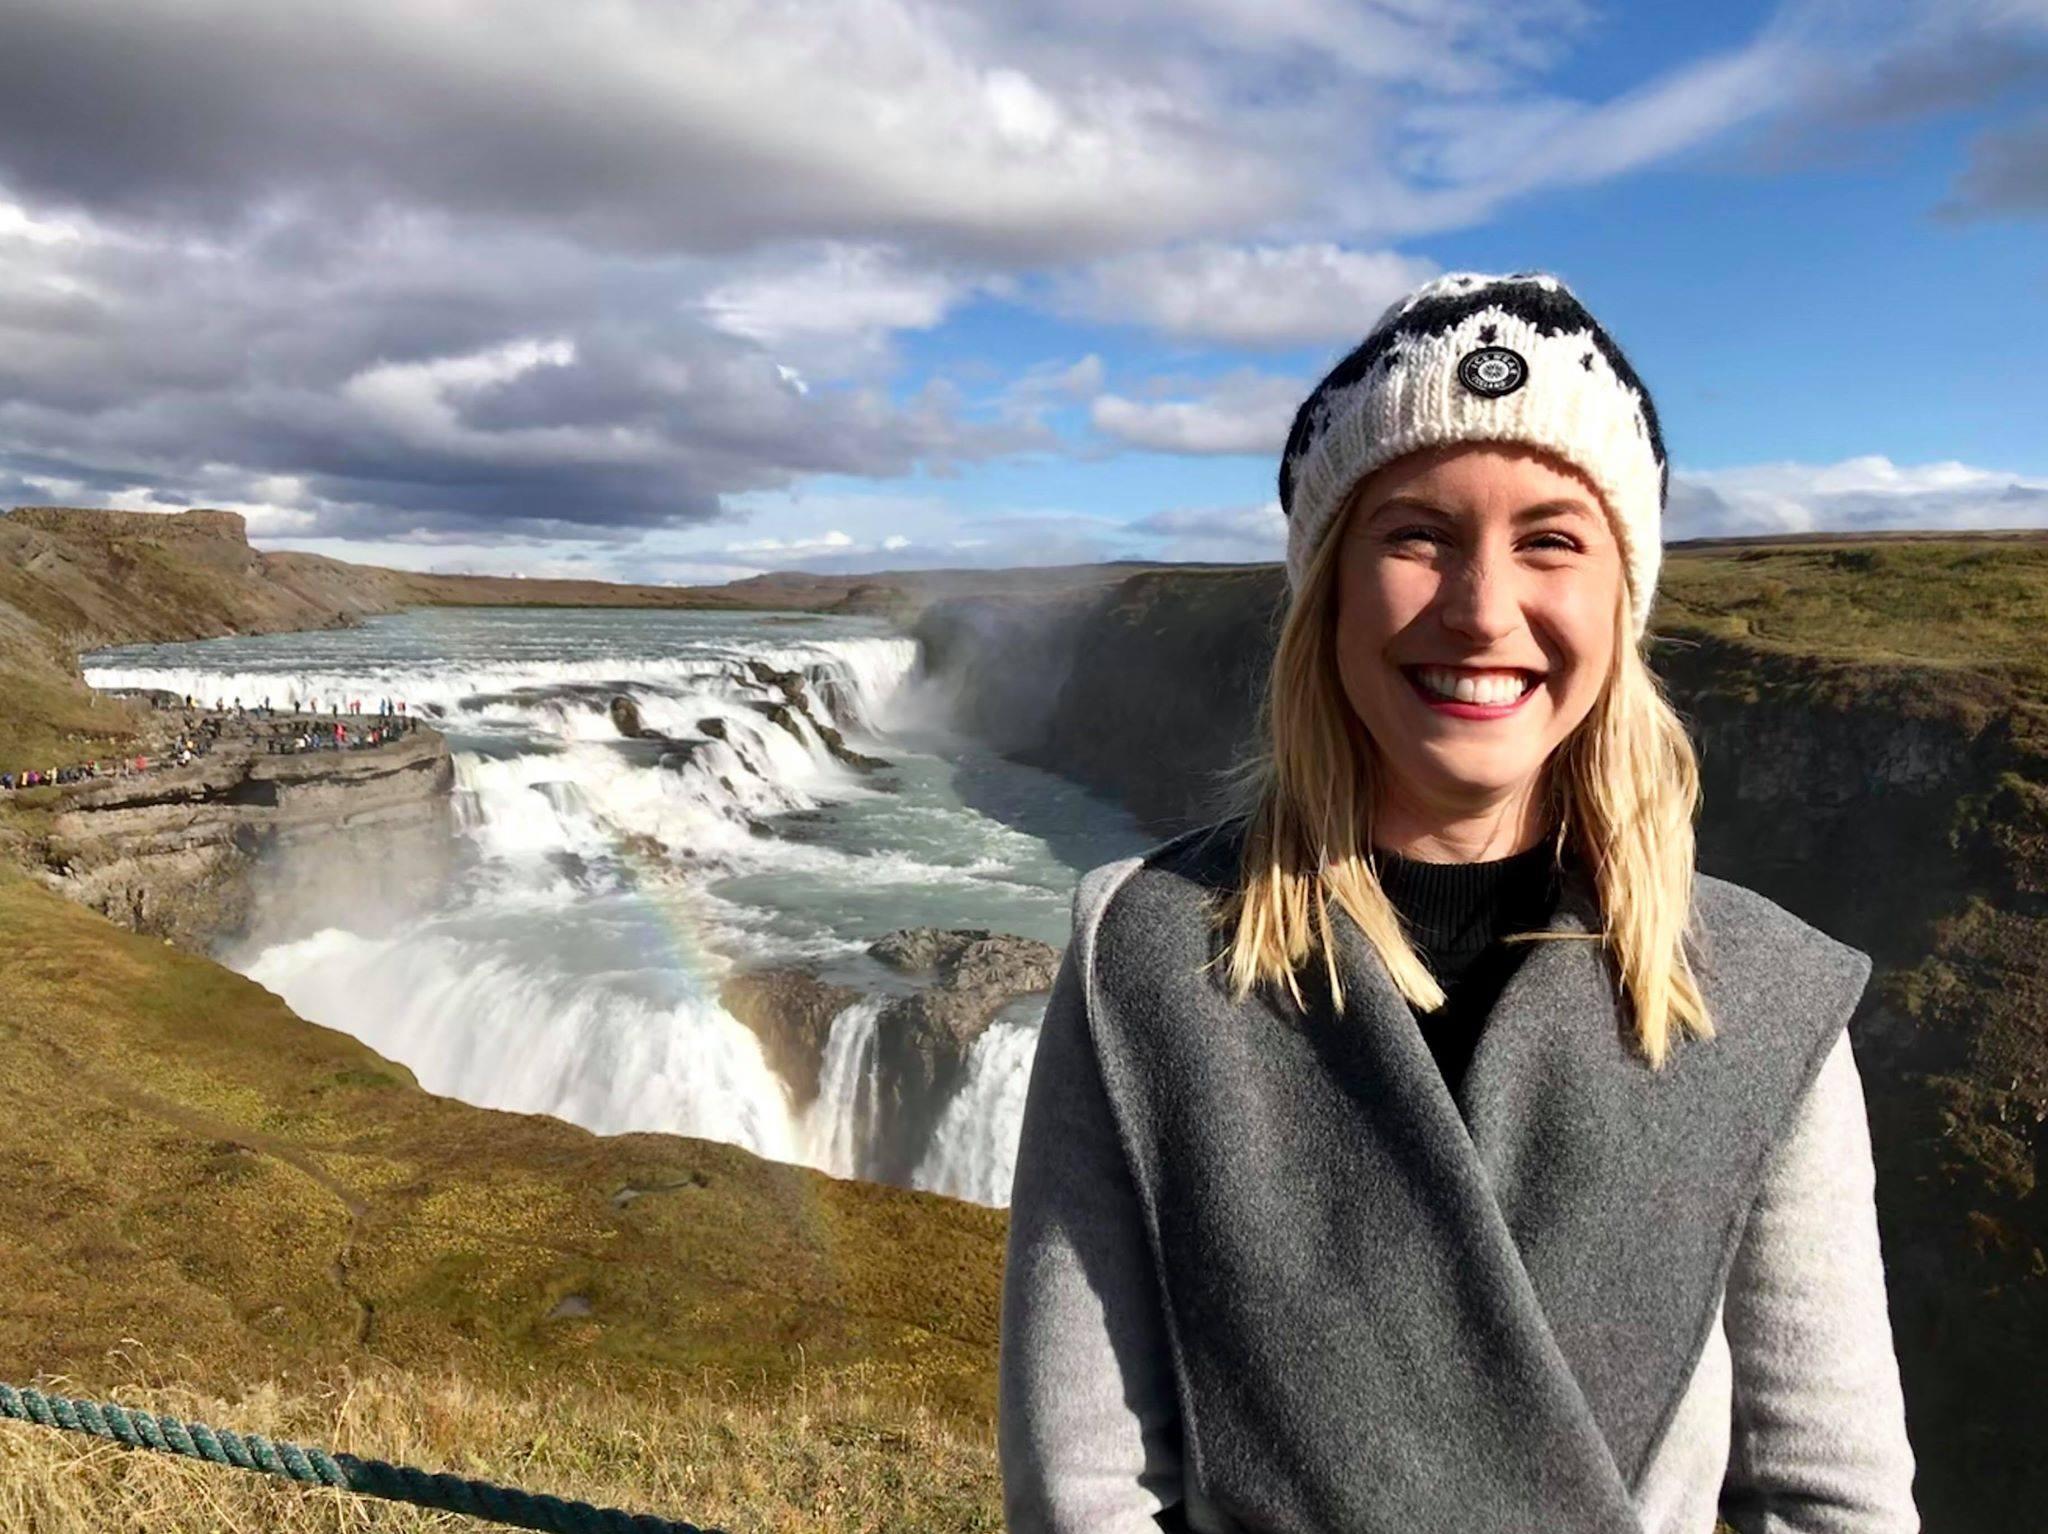 Jessica Wall, Program Director